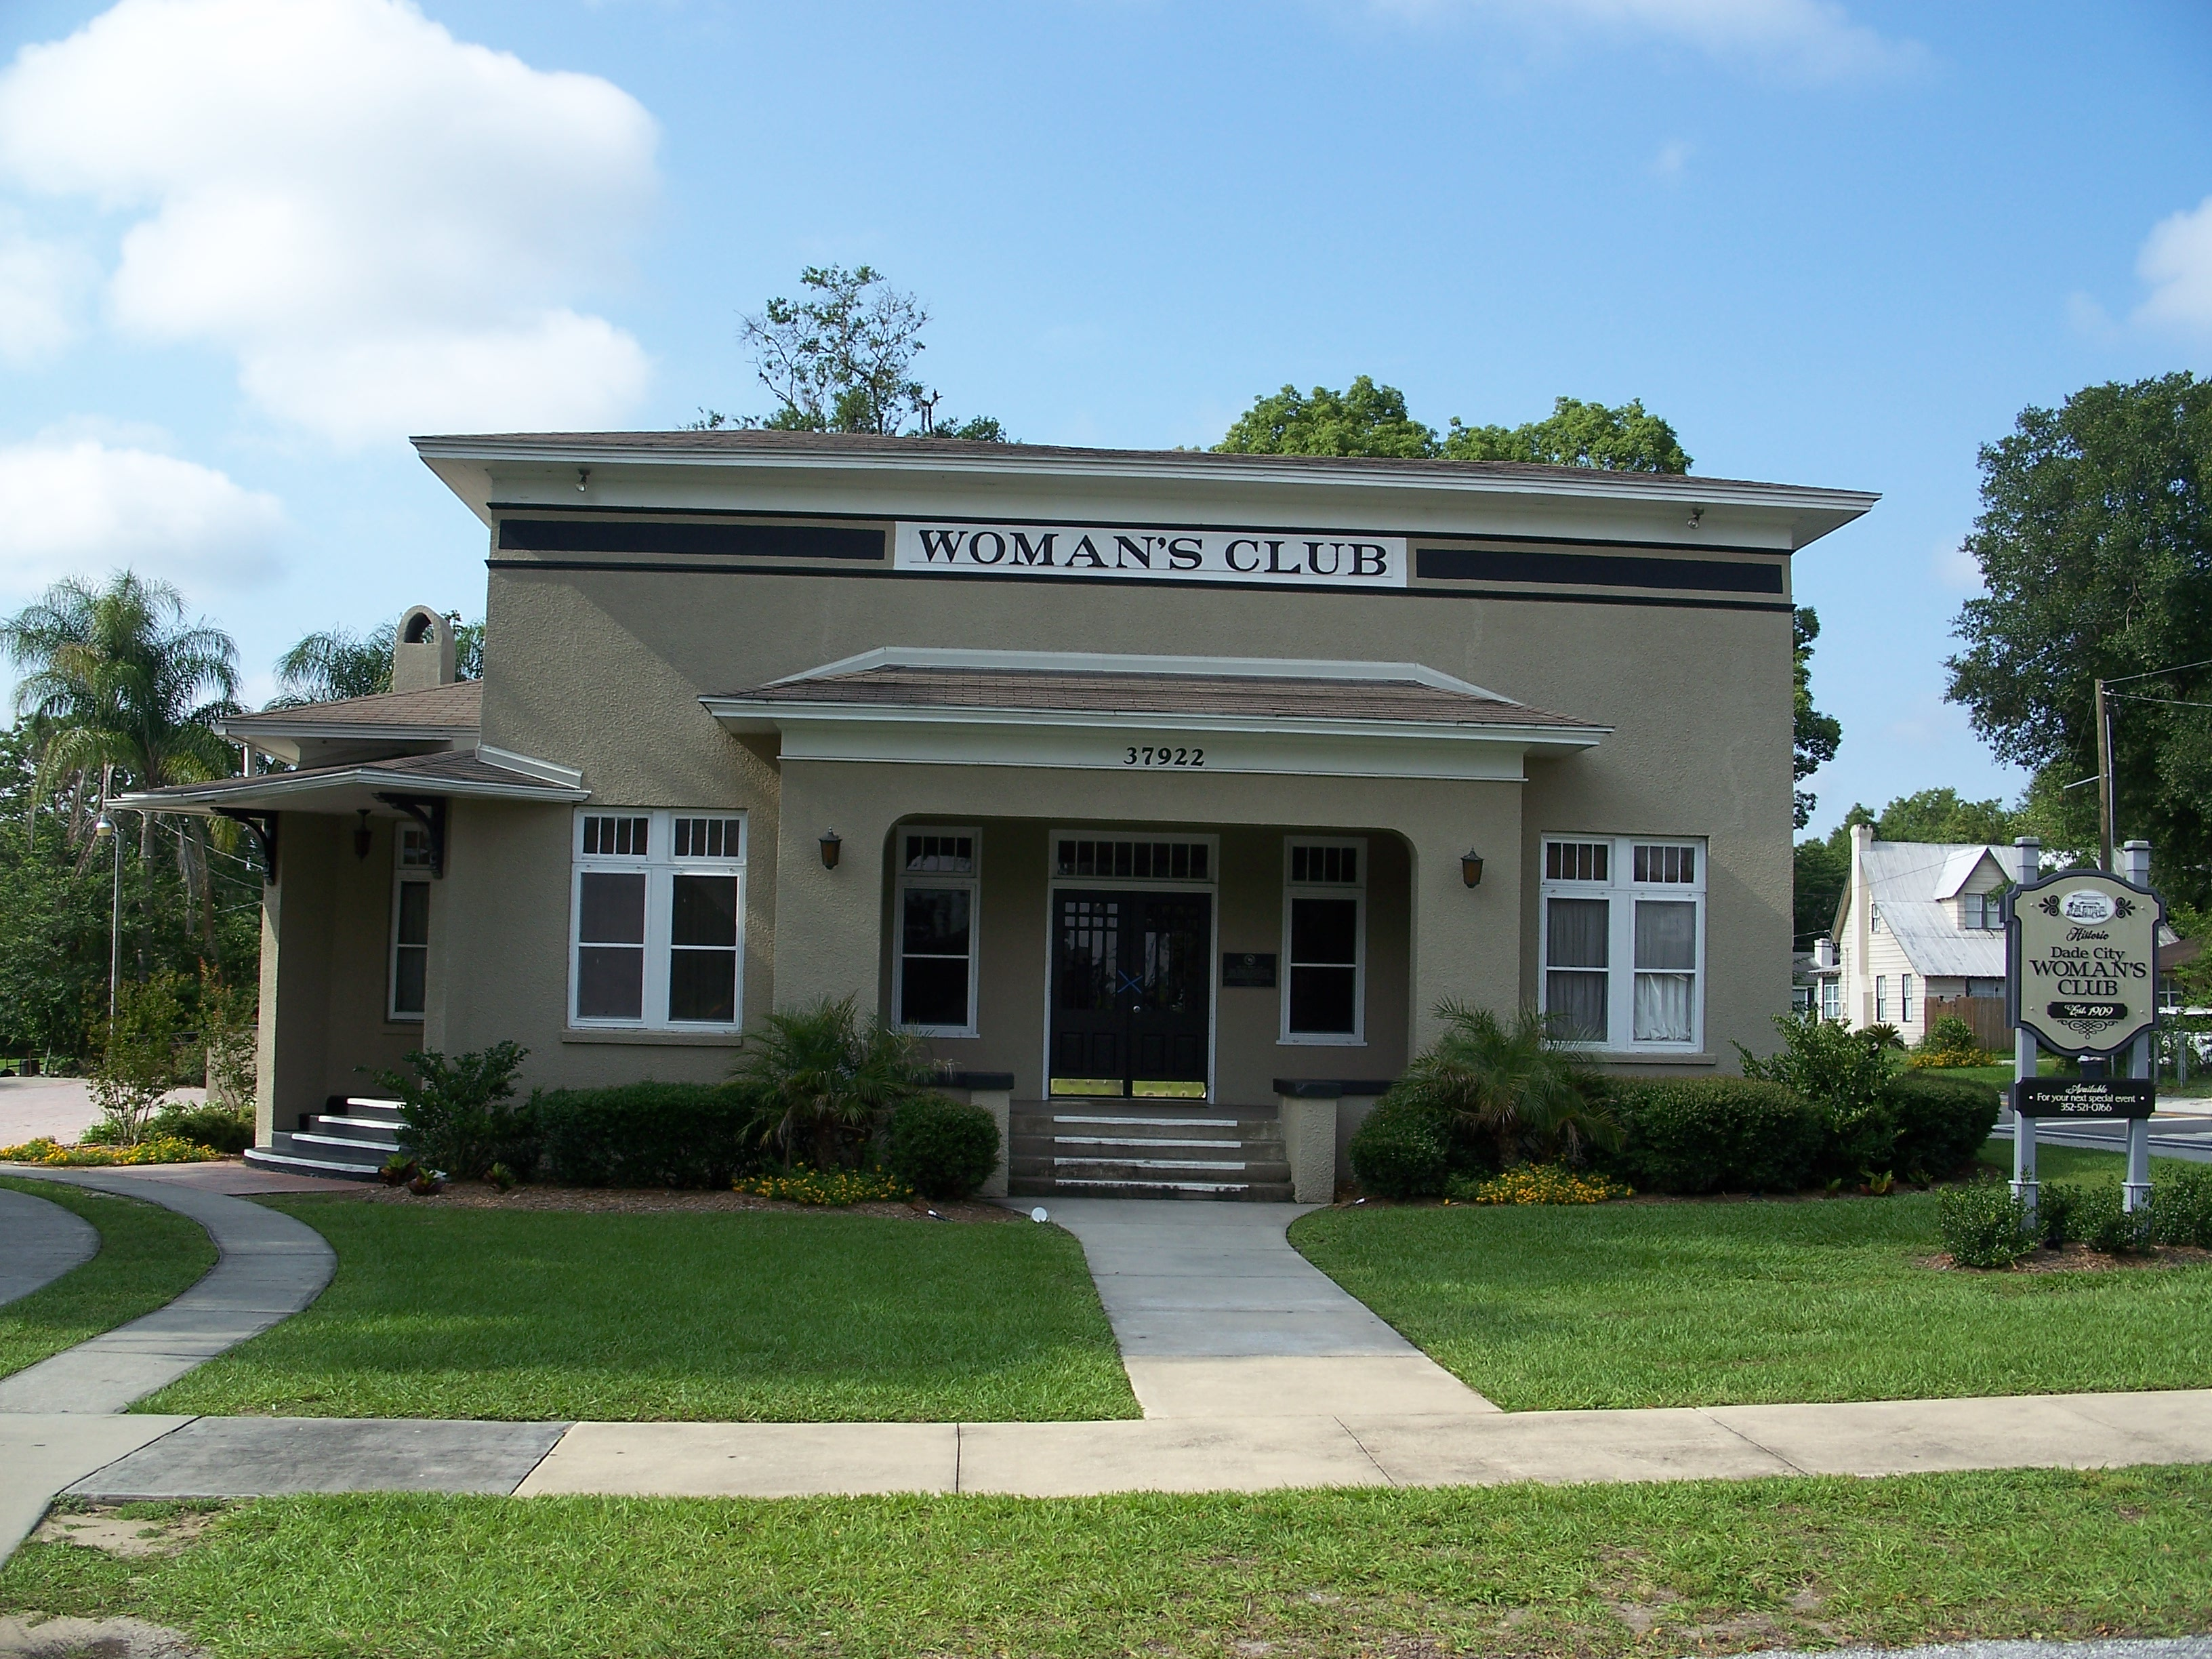 725bc3b3 Dade City Woman's Club - Wikipedia